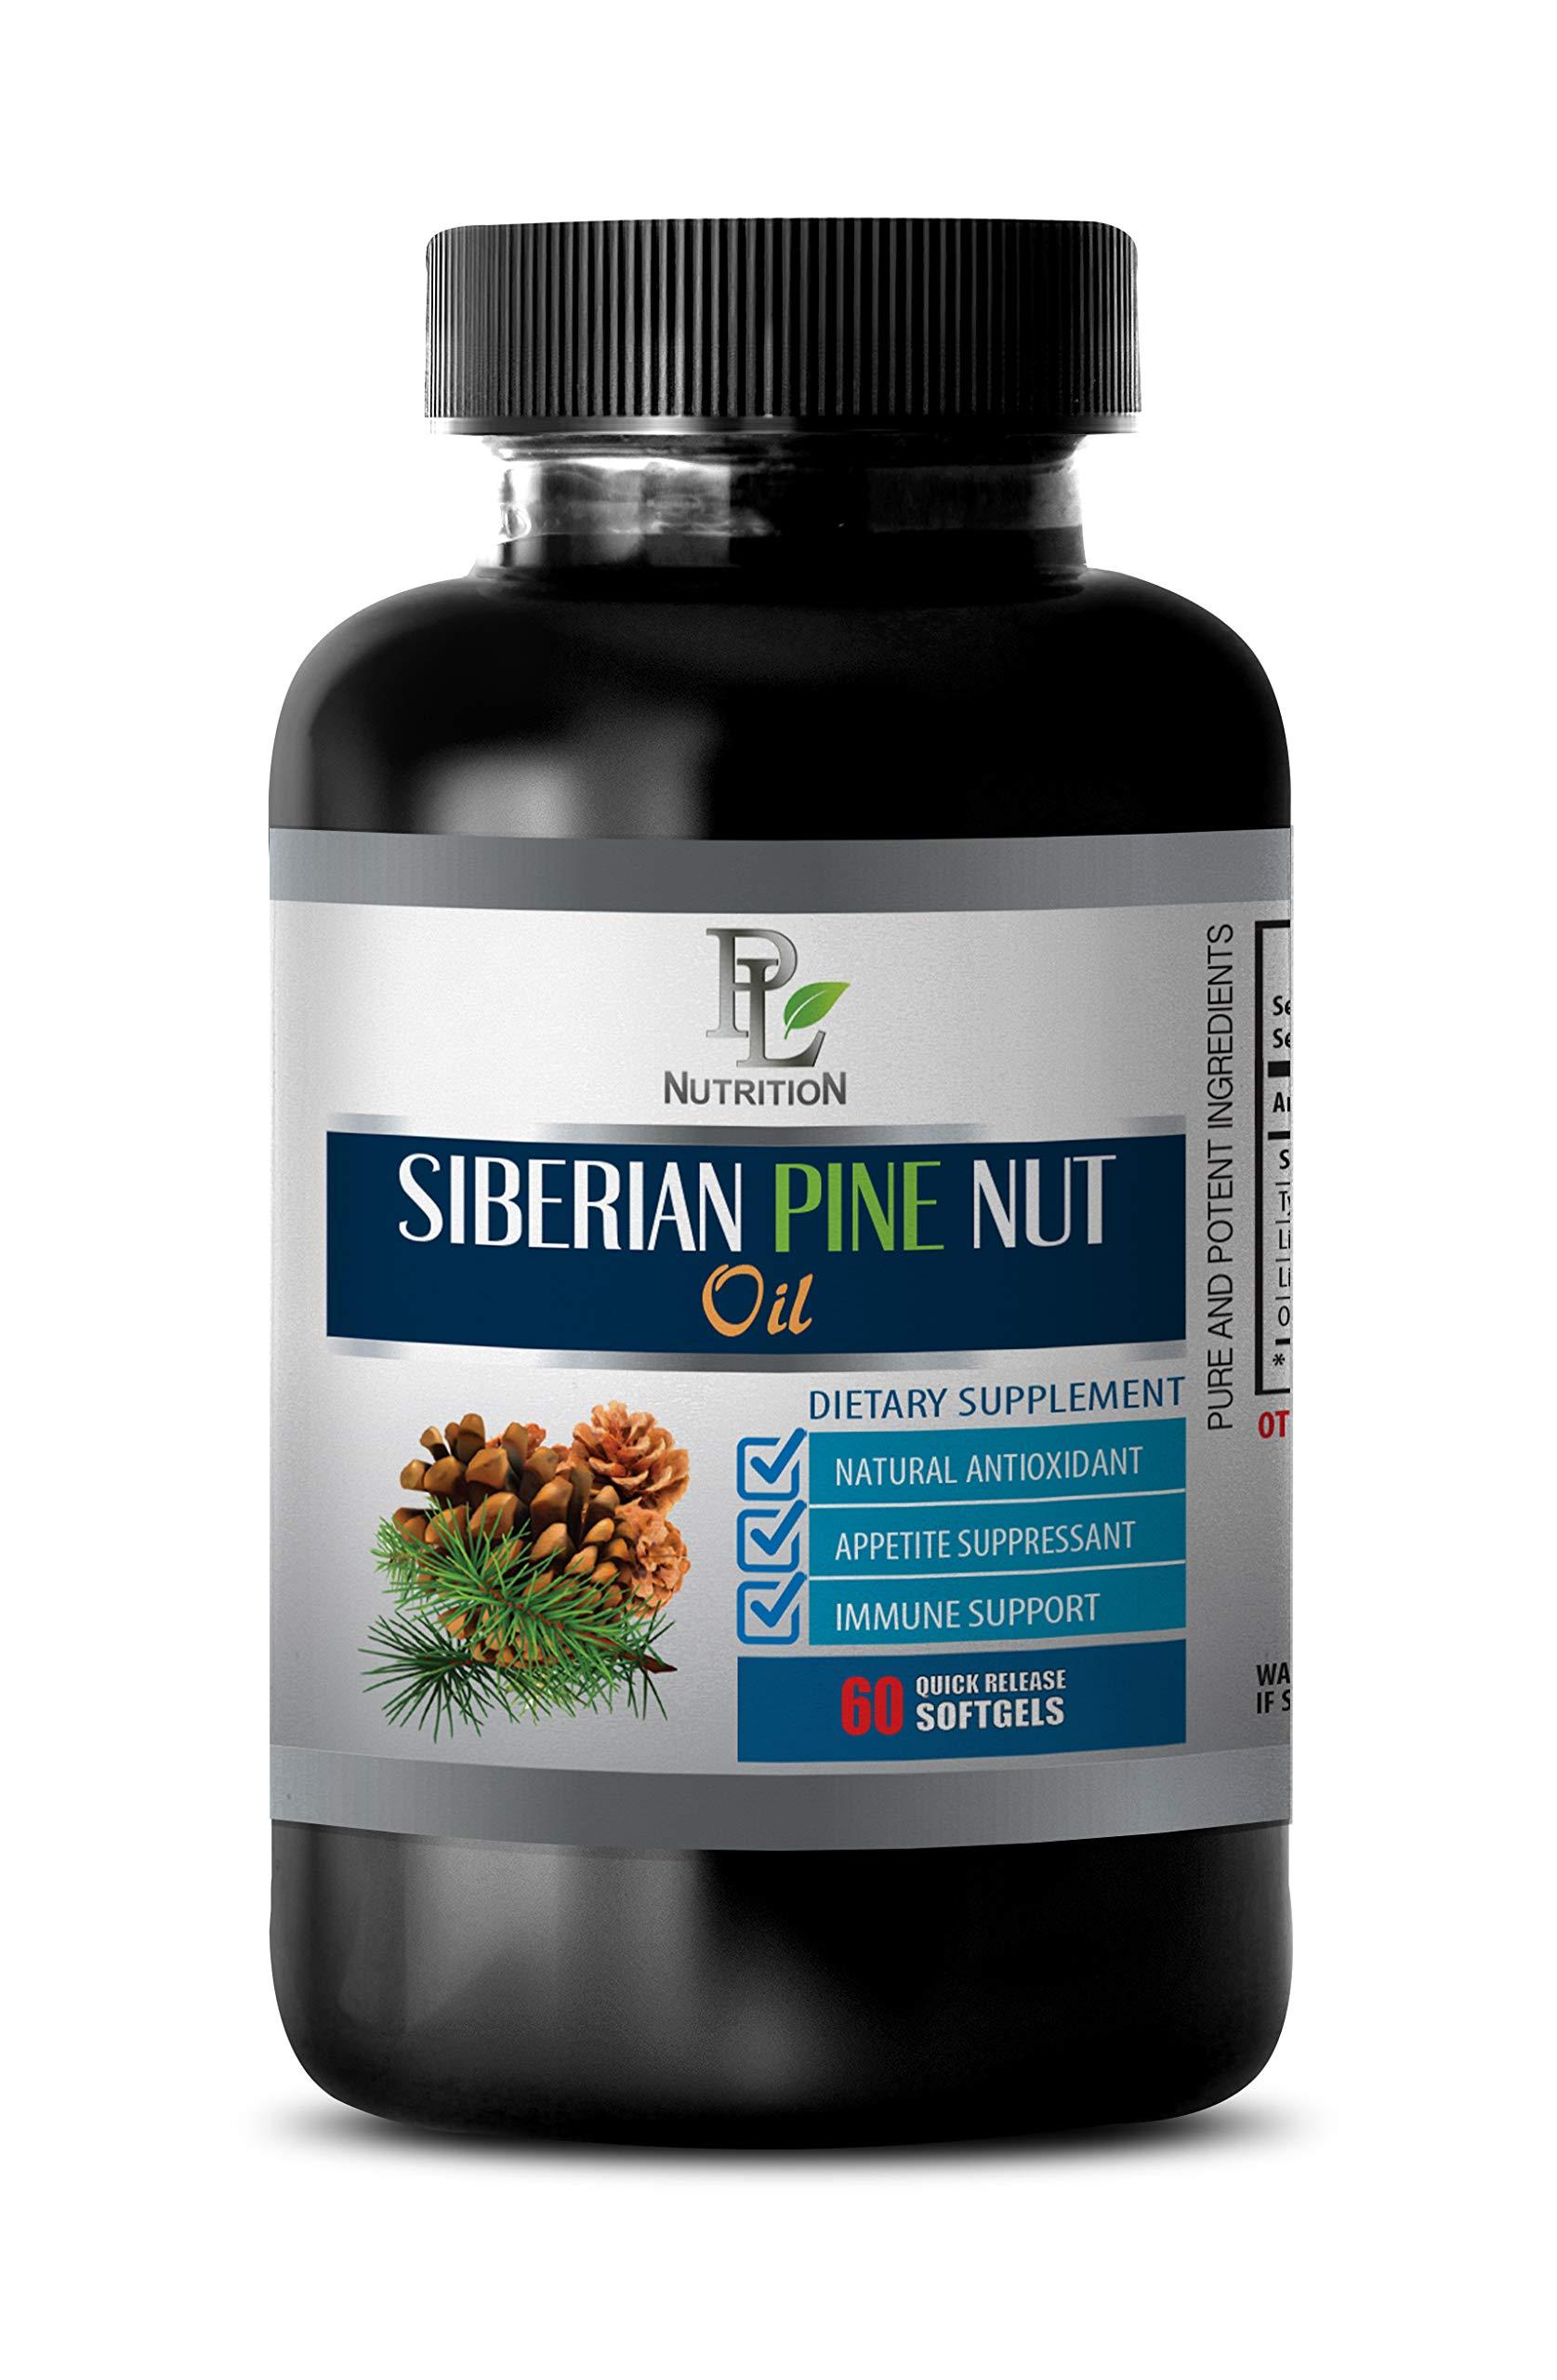 Immunity Vitamins for Adults - Siberian Pine NUT Oil - Dietary Supplement - Pine nut Oil Supplement - 1 Bottle 60 Softgels